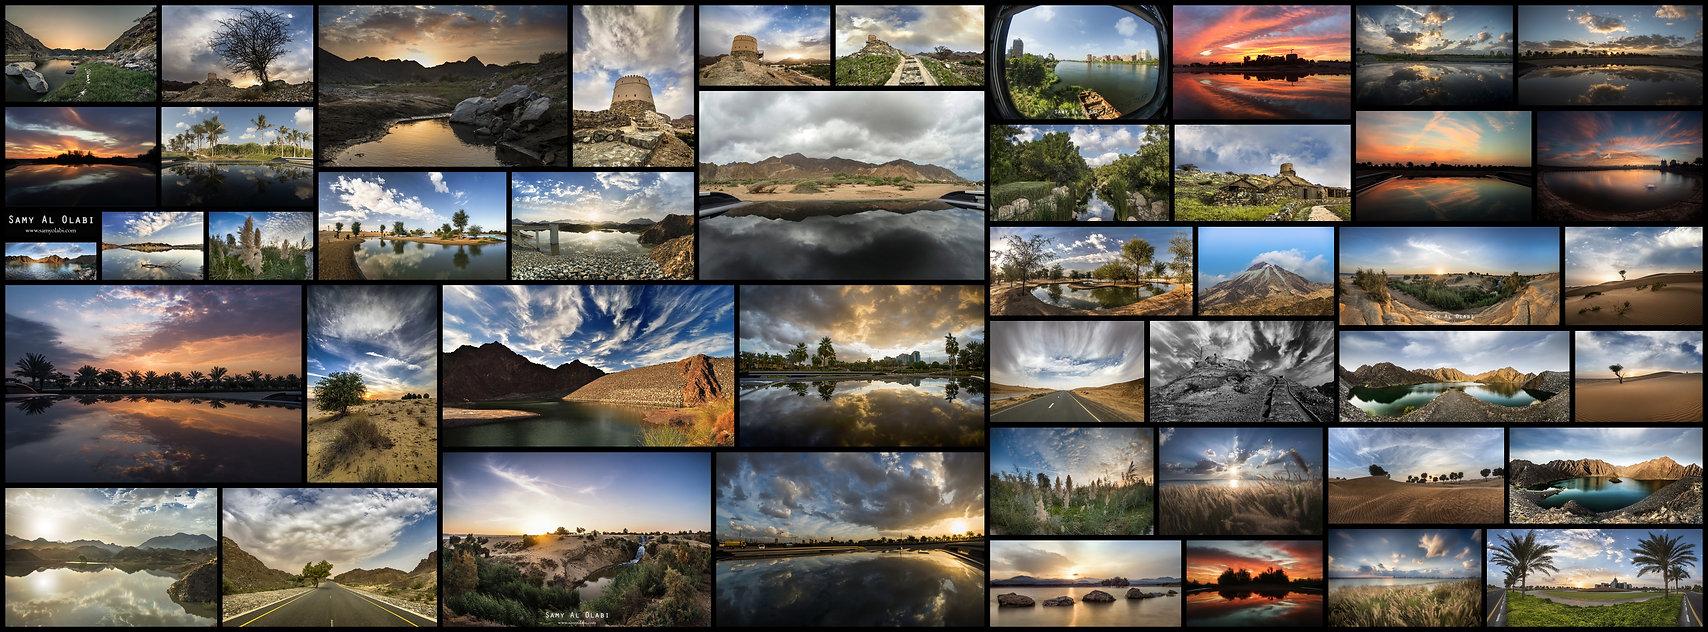 Landscapes-Samyolabi (1).jpg